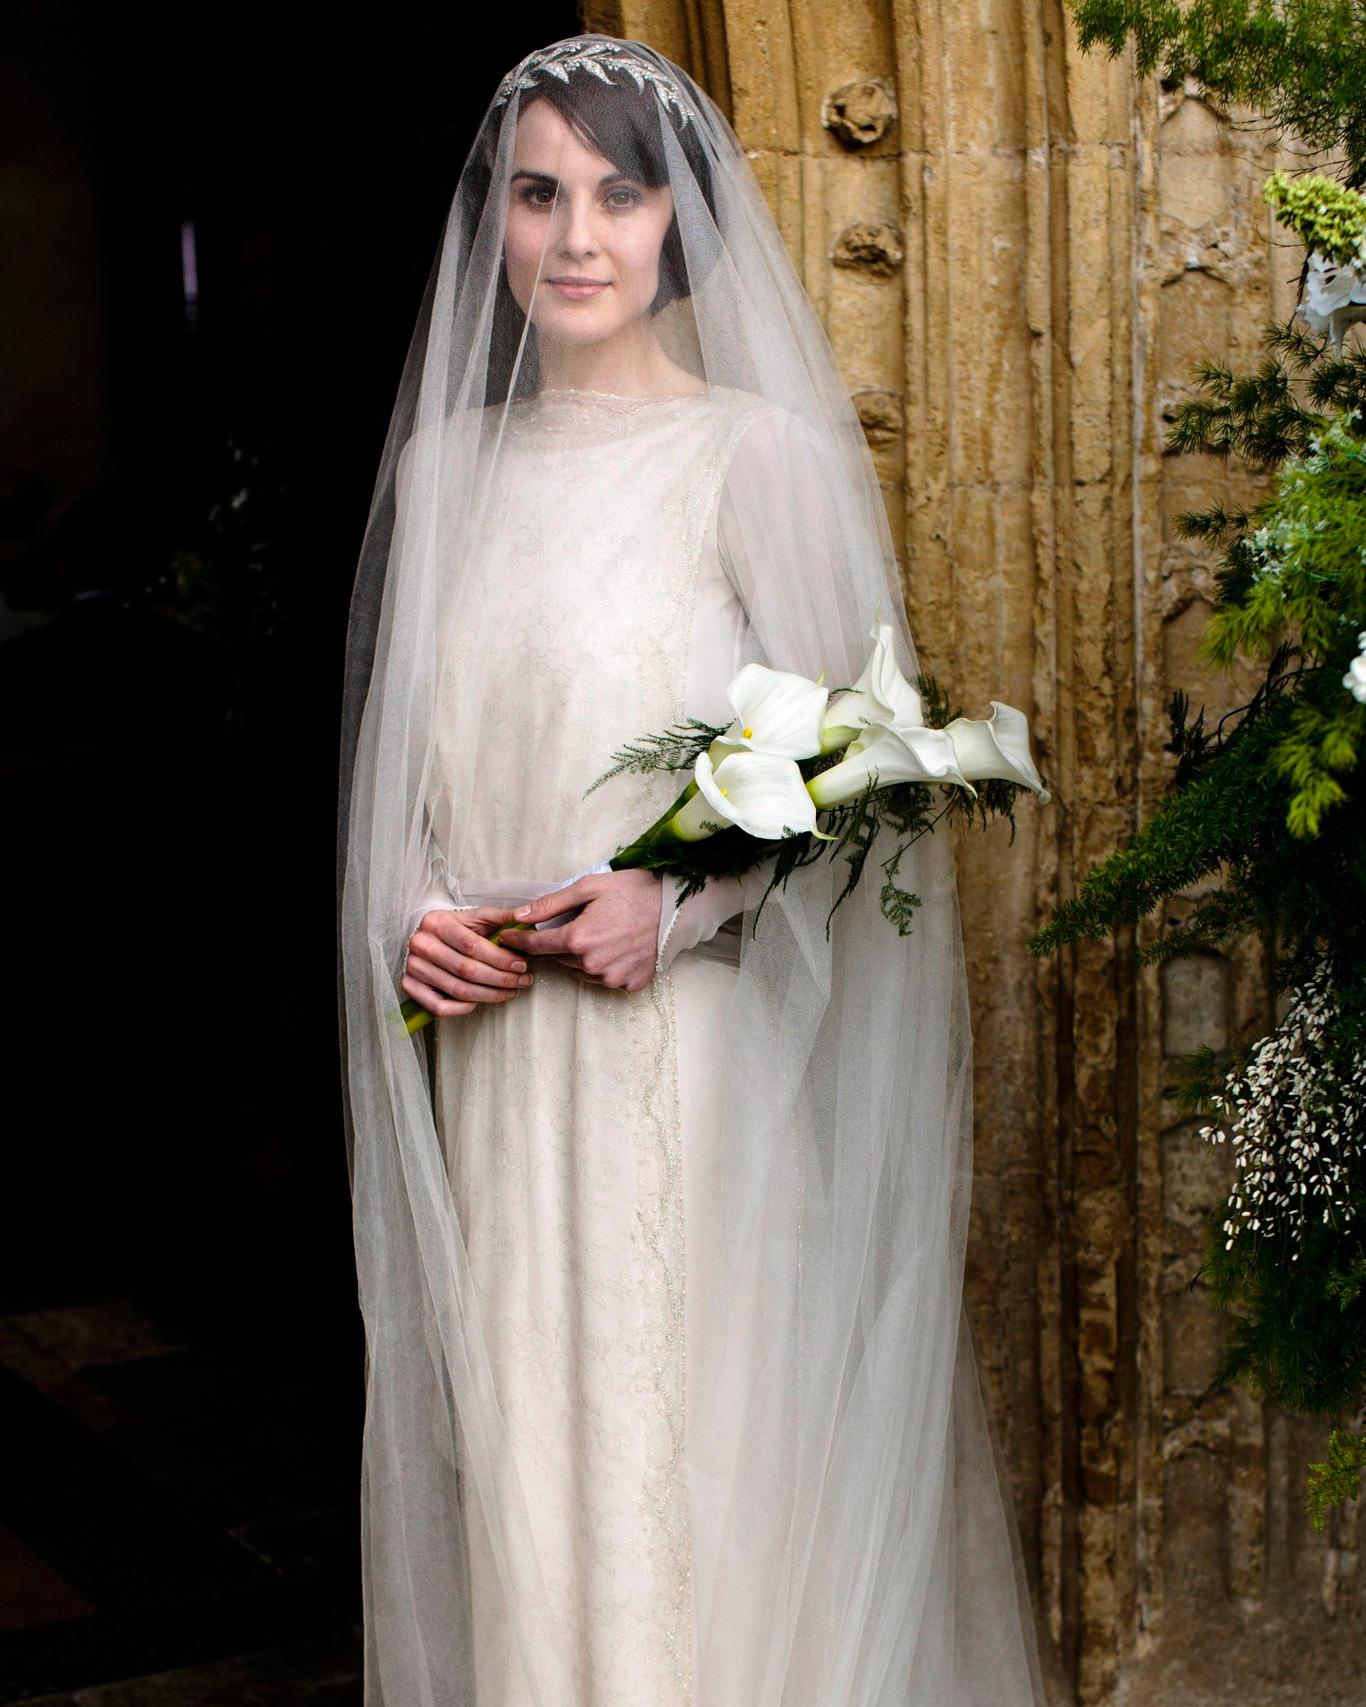 tv-wedding-dresses-downton-abbey-mary-1115.jpg